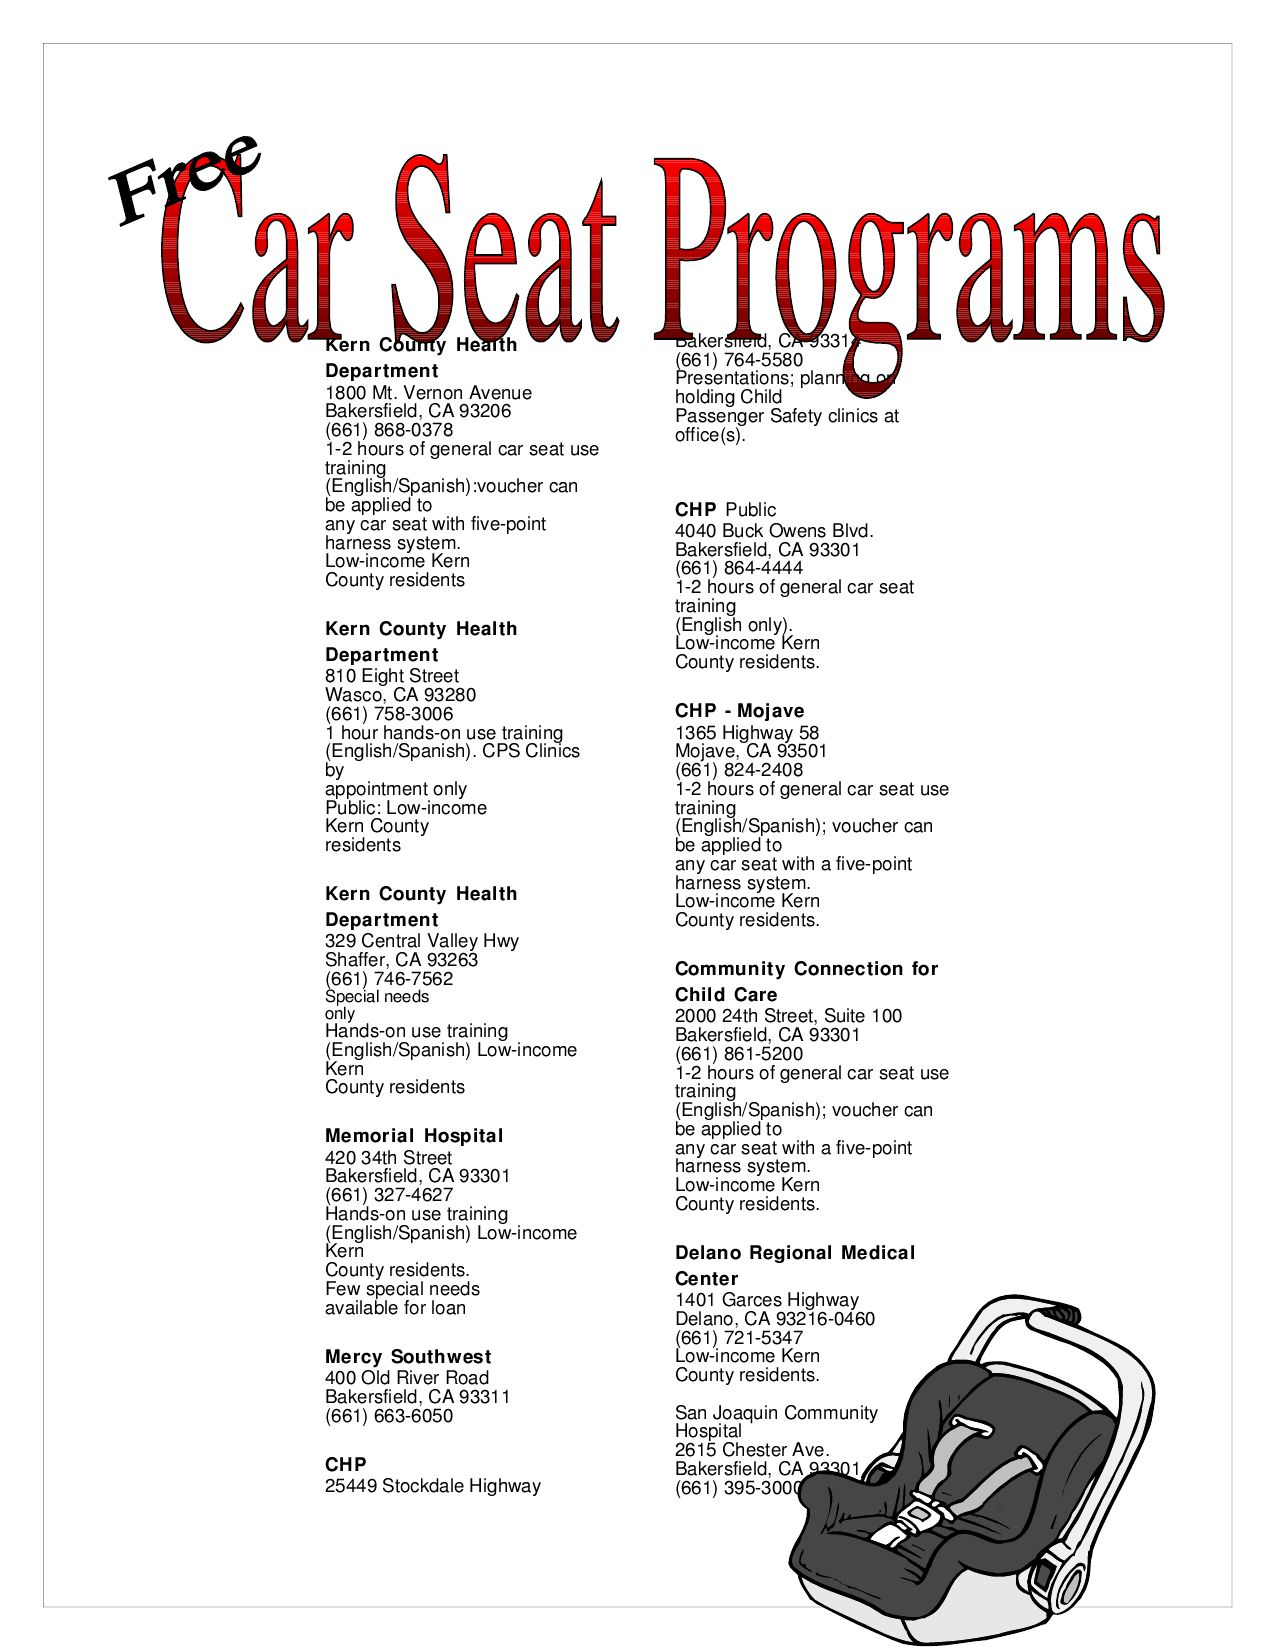 4 seat sports car